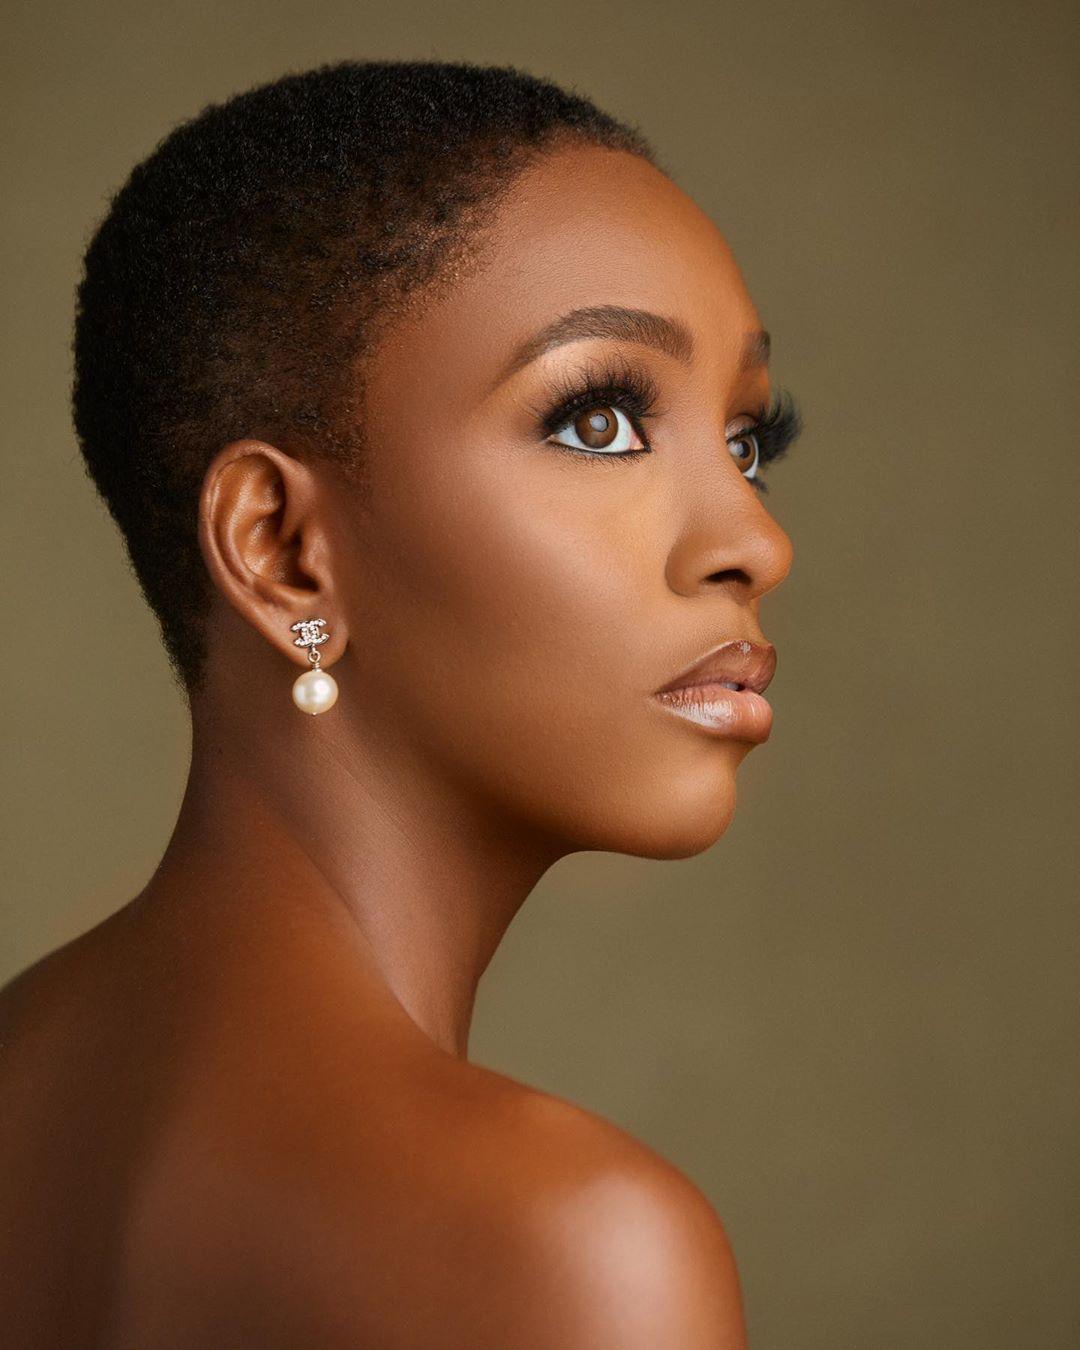 Miss Nigeria 2016 Chioma Obiadi Birthday Shoot